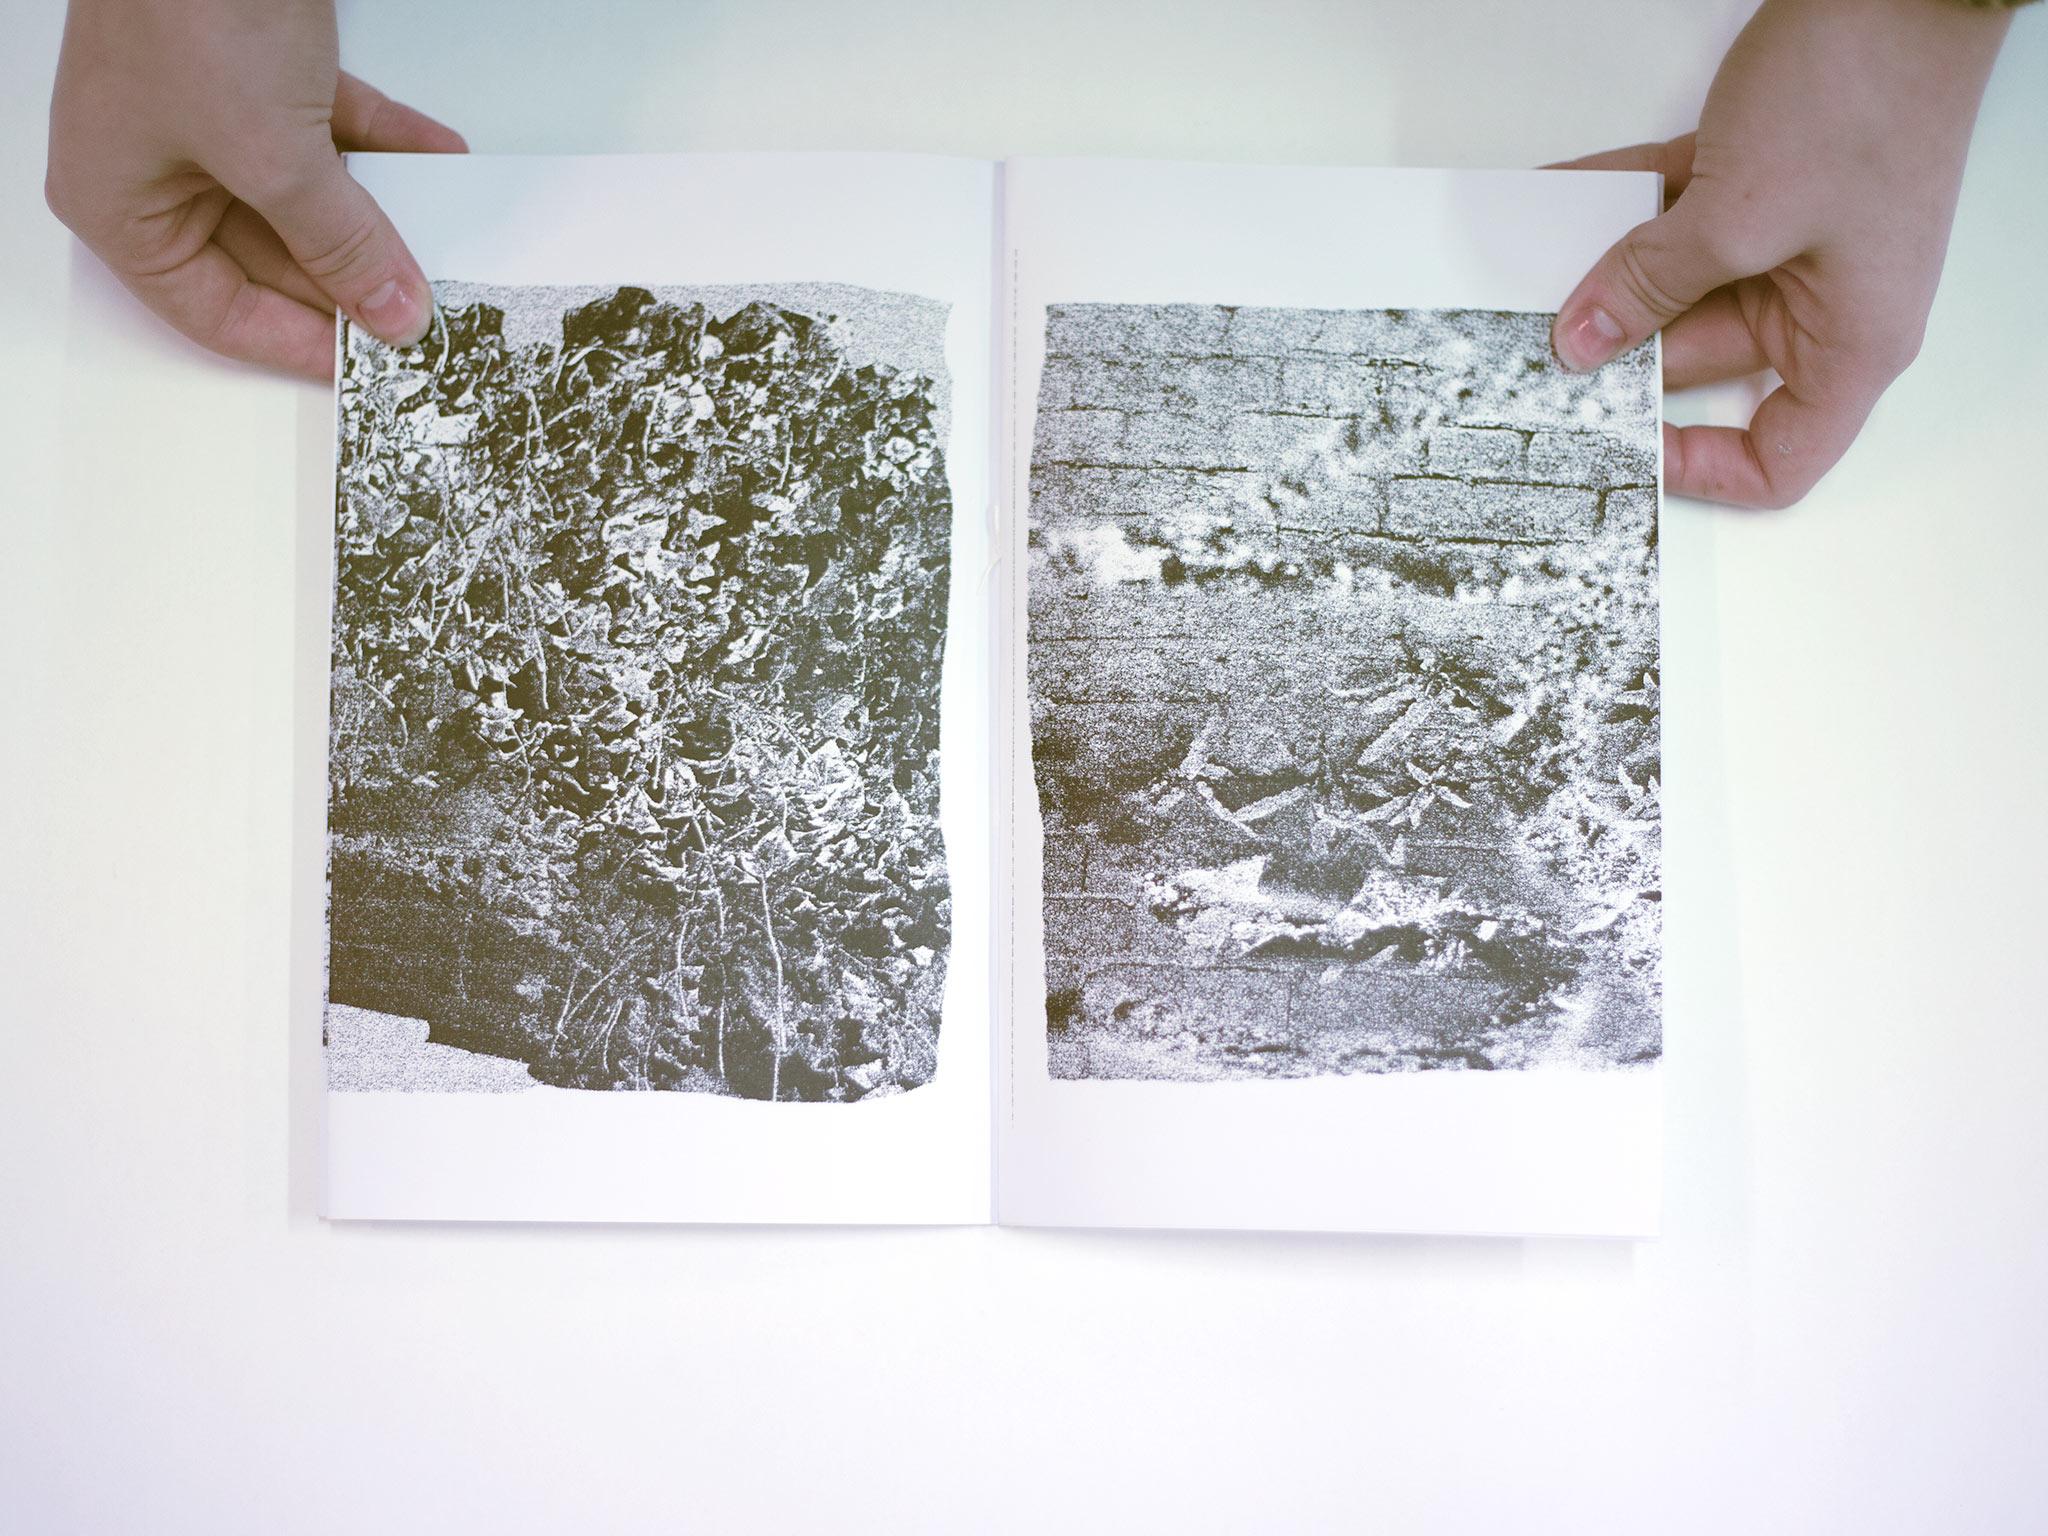 paula-roush-st-charles-centre-photobook-workshops-13